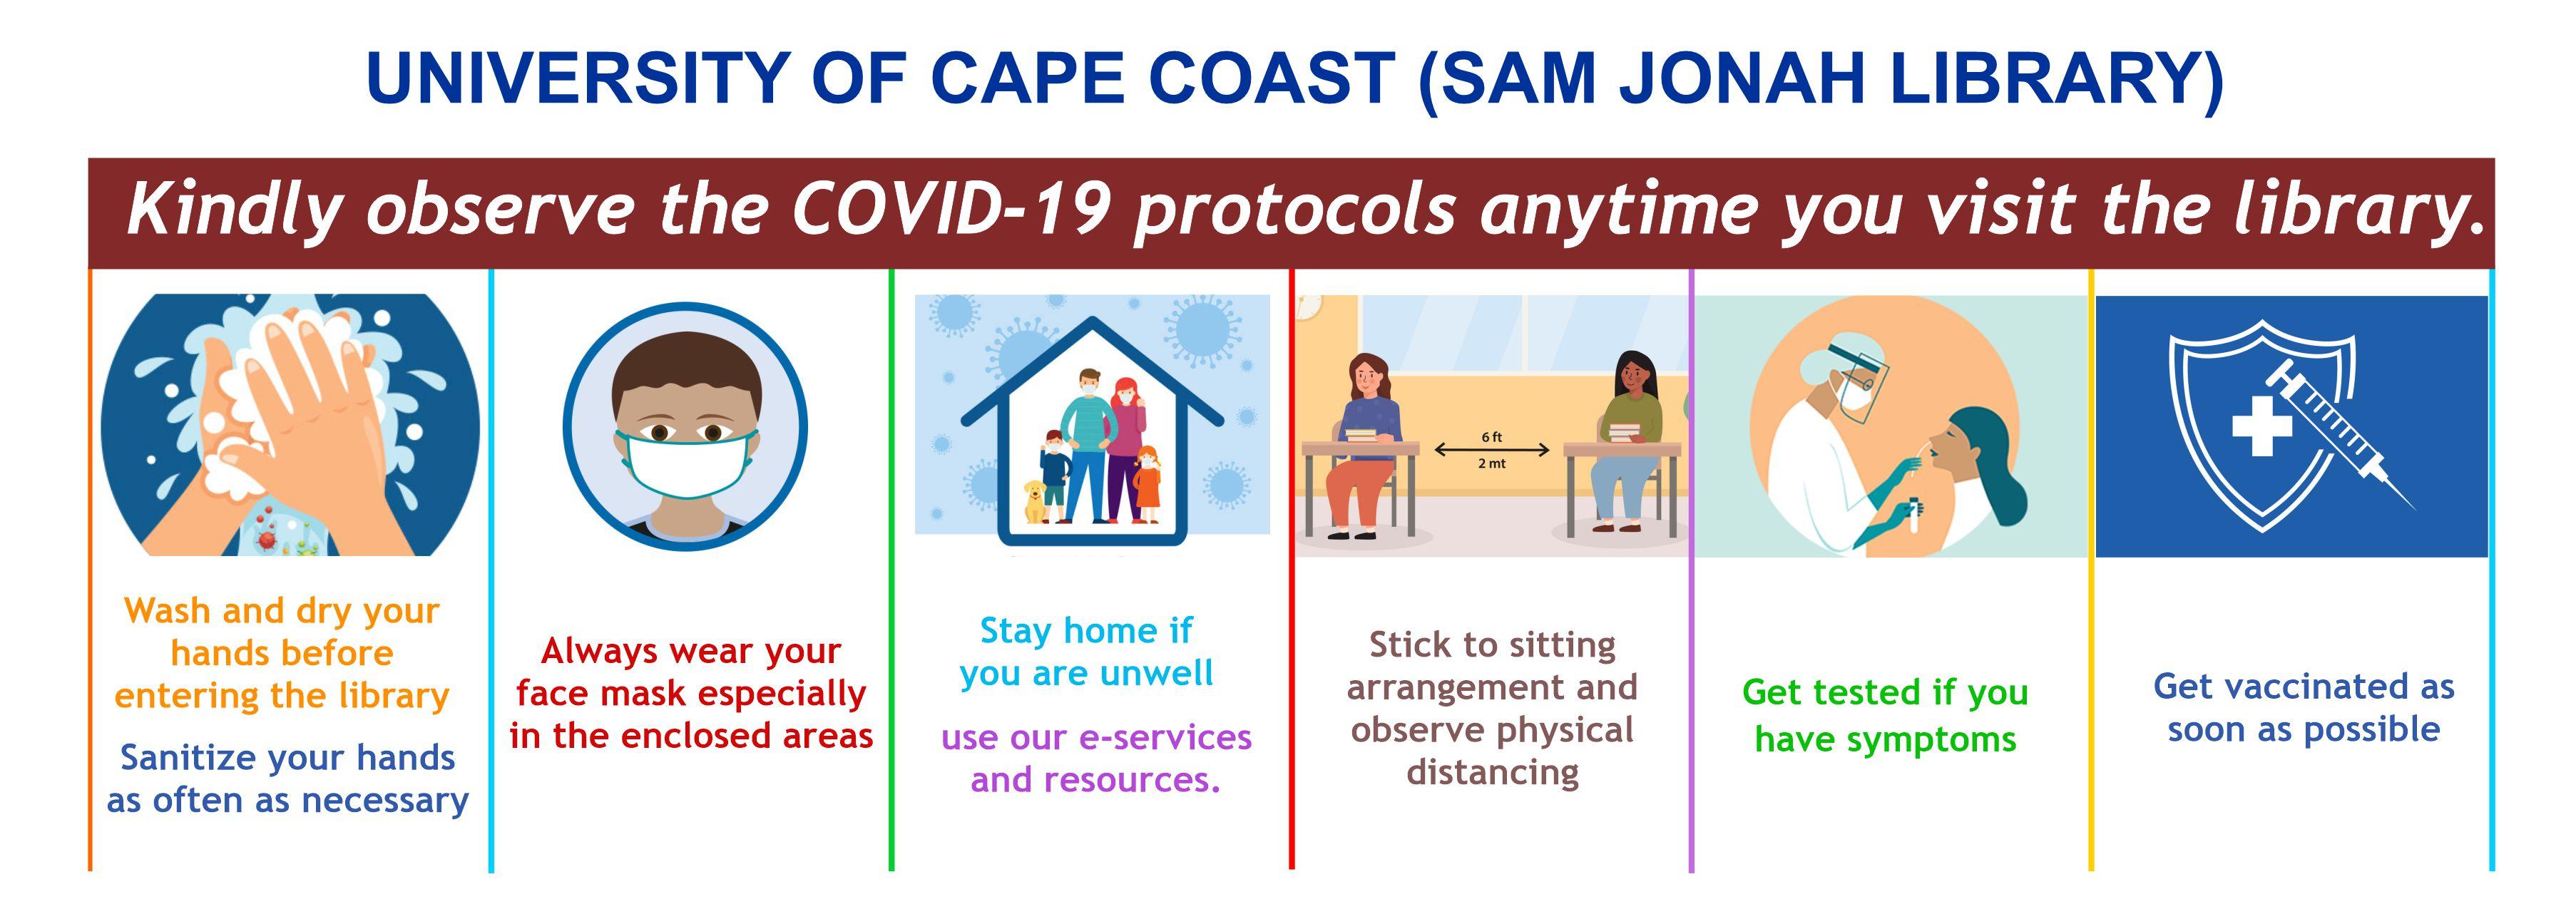 UNIVERSITY OF CAPE COAST RESPONSE TO COVID -19 AND SAFTEY PROTOCOLS